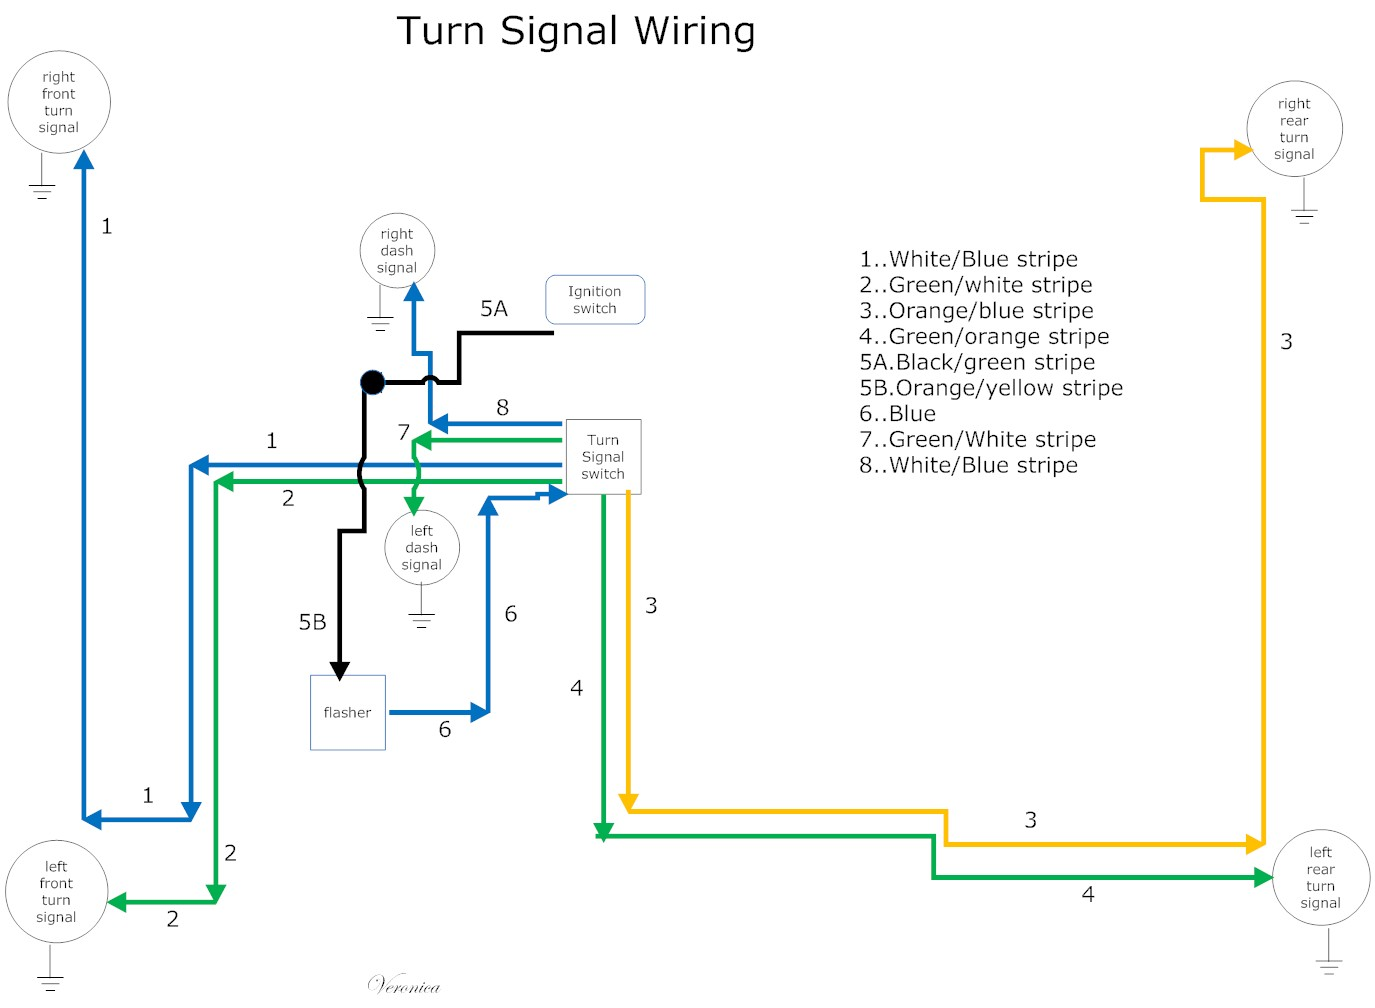 2012 jeep wrangler turn signal wiring diagram somurich com rh somurich com jeep cj7 turn signal [ 1375 x 1008 Pixel ]